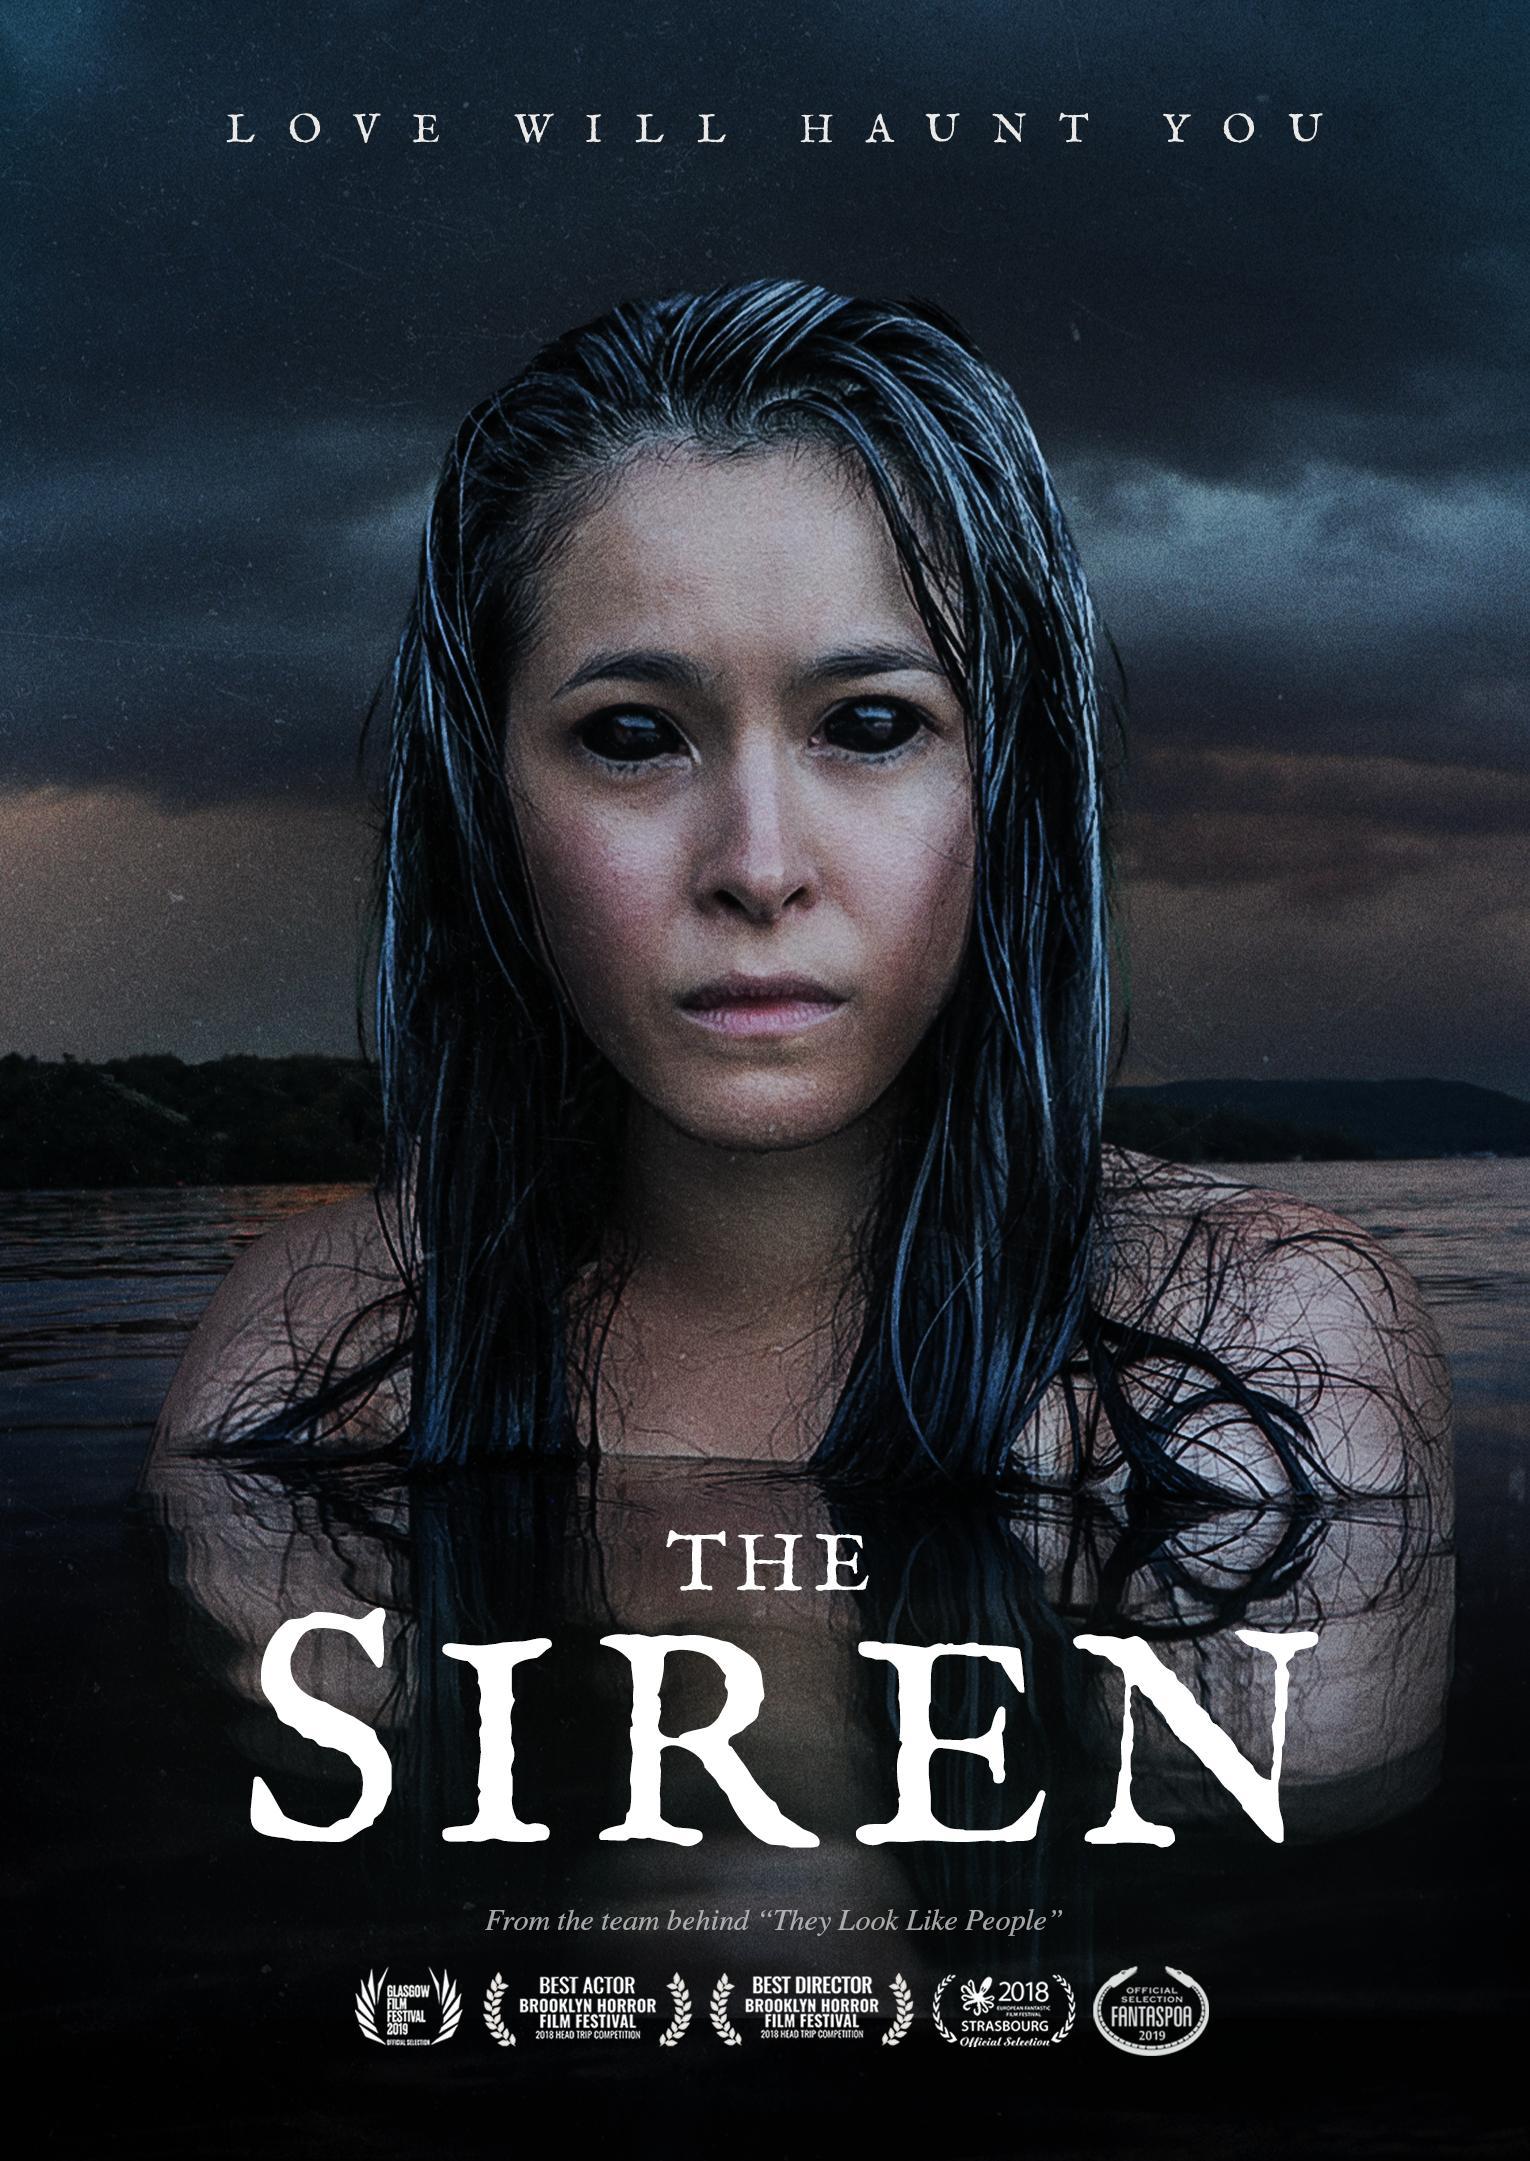 The Siren 2019 Imdb